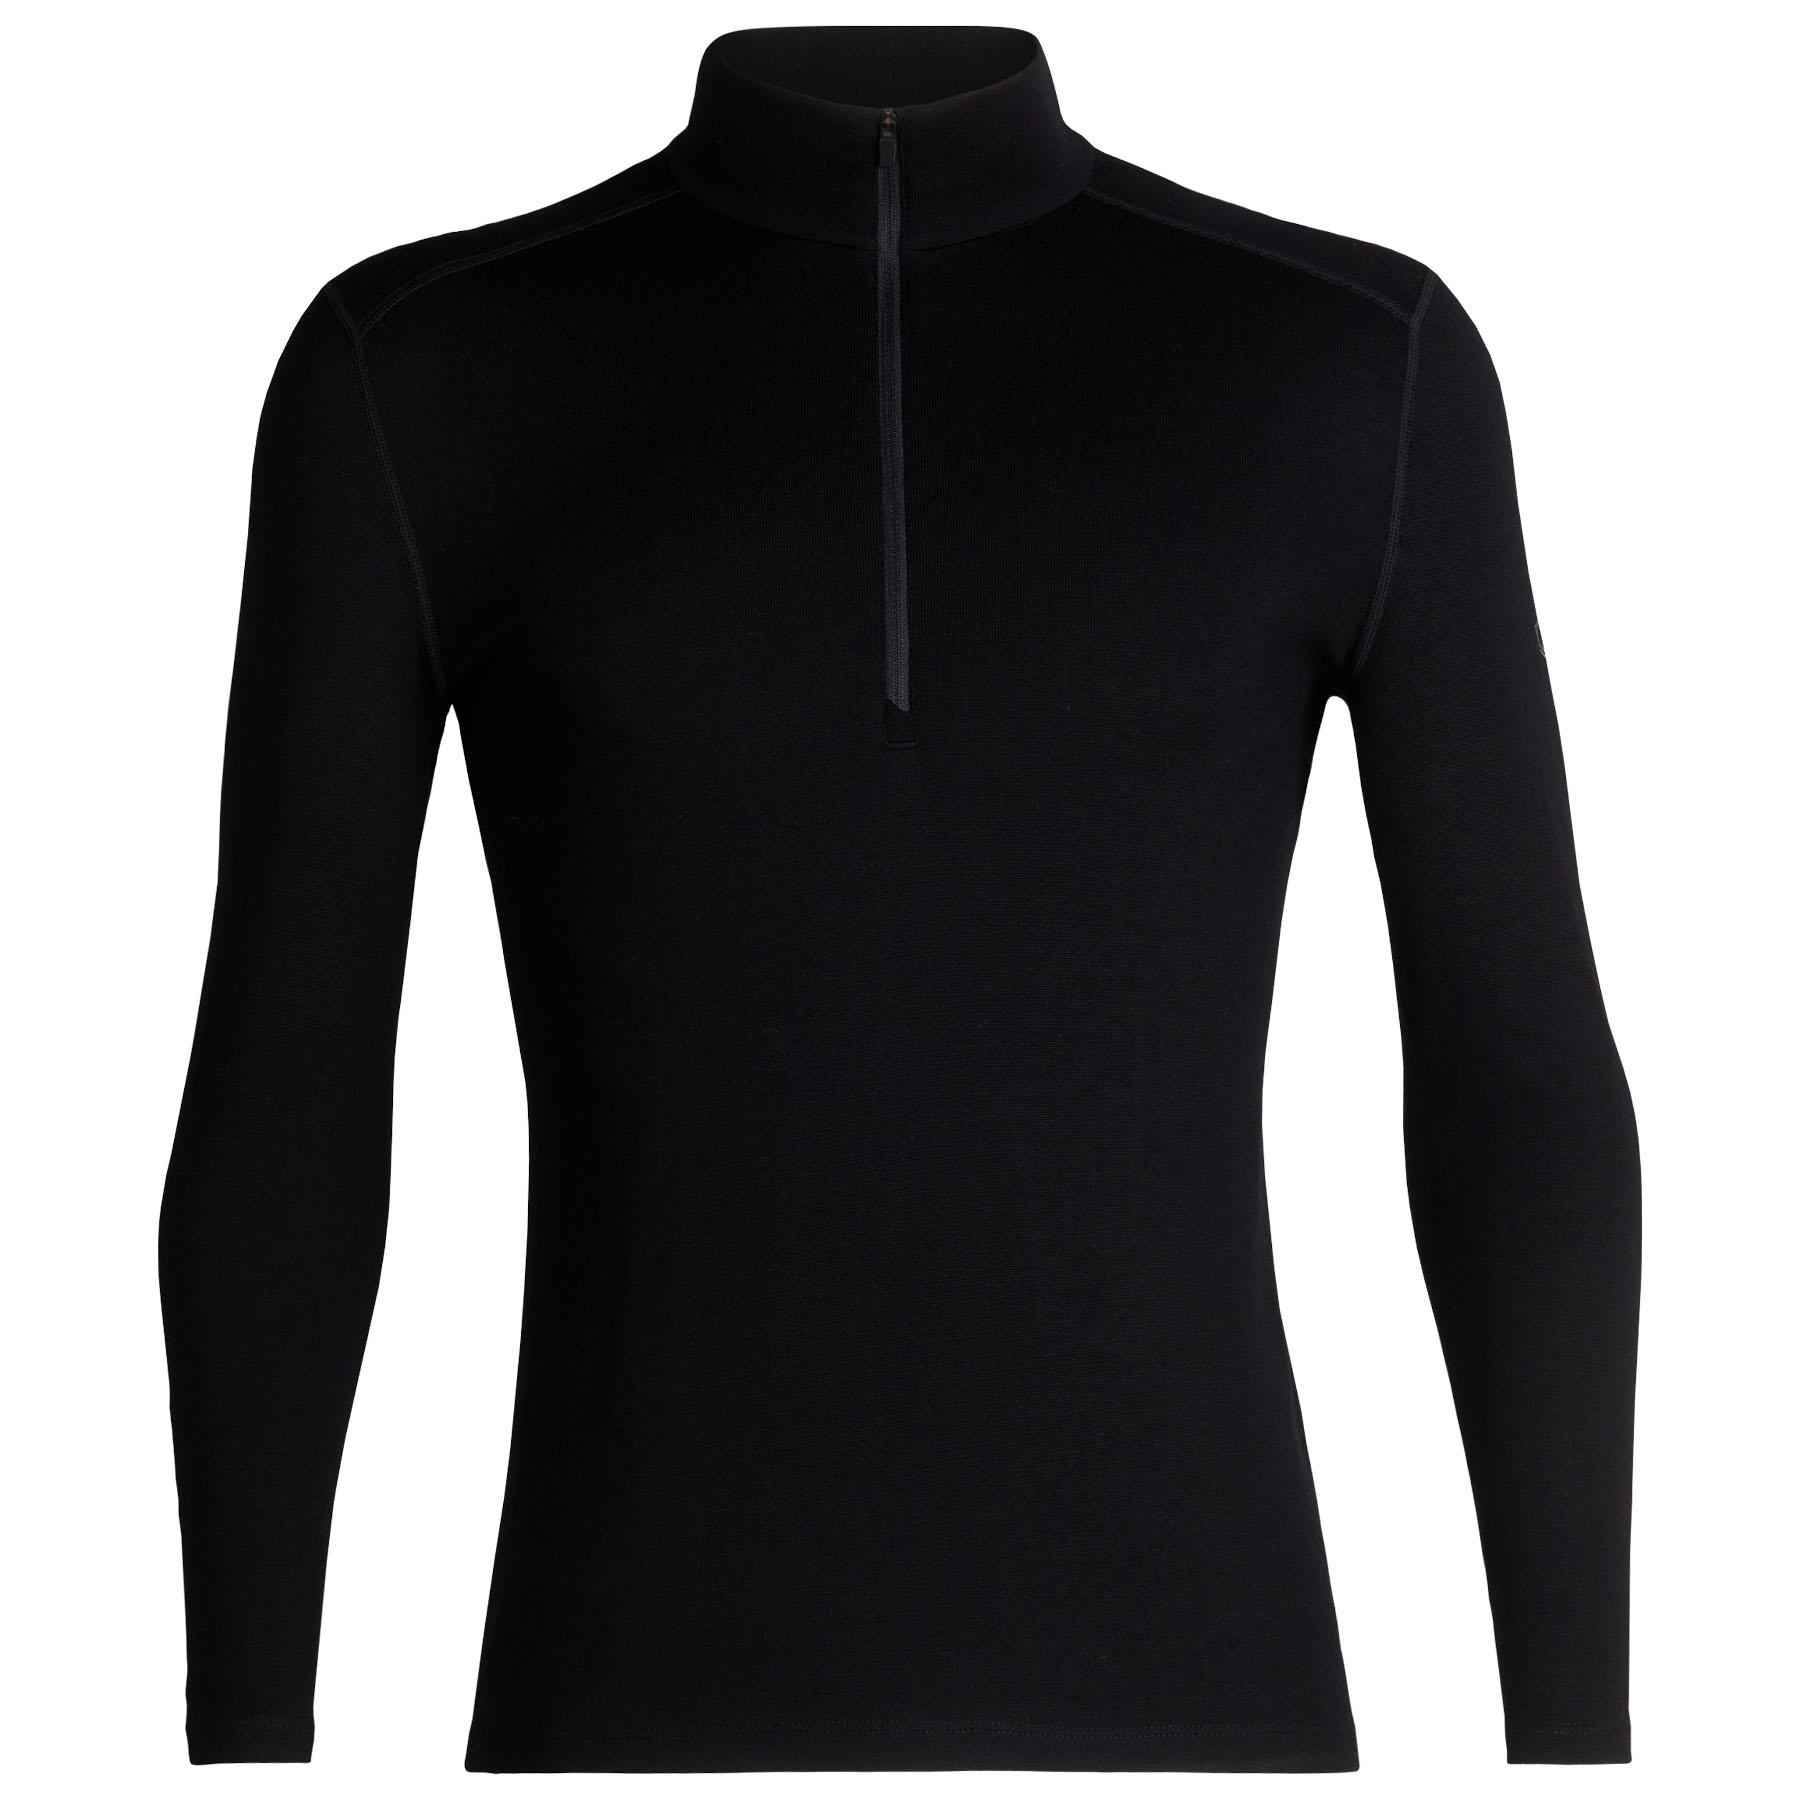 Produktbild von Icebreaker 260 Tech Half Zip Herren Langarmshirt - Black